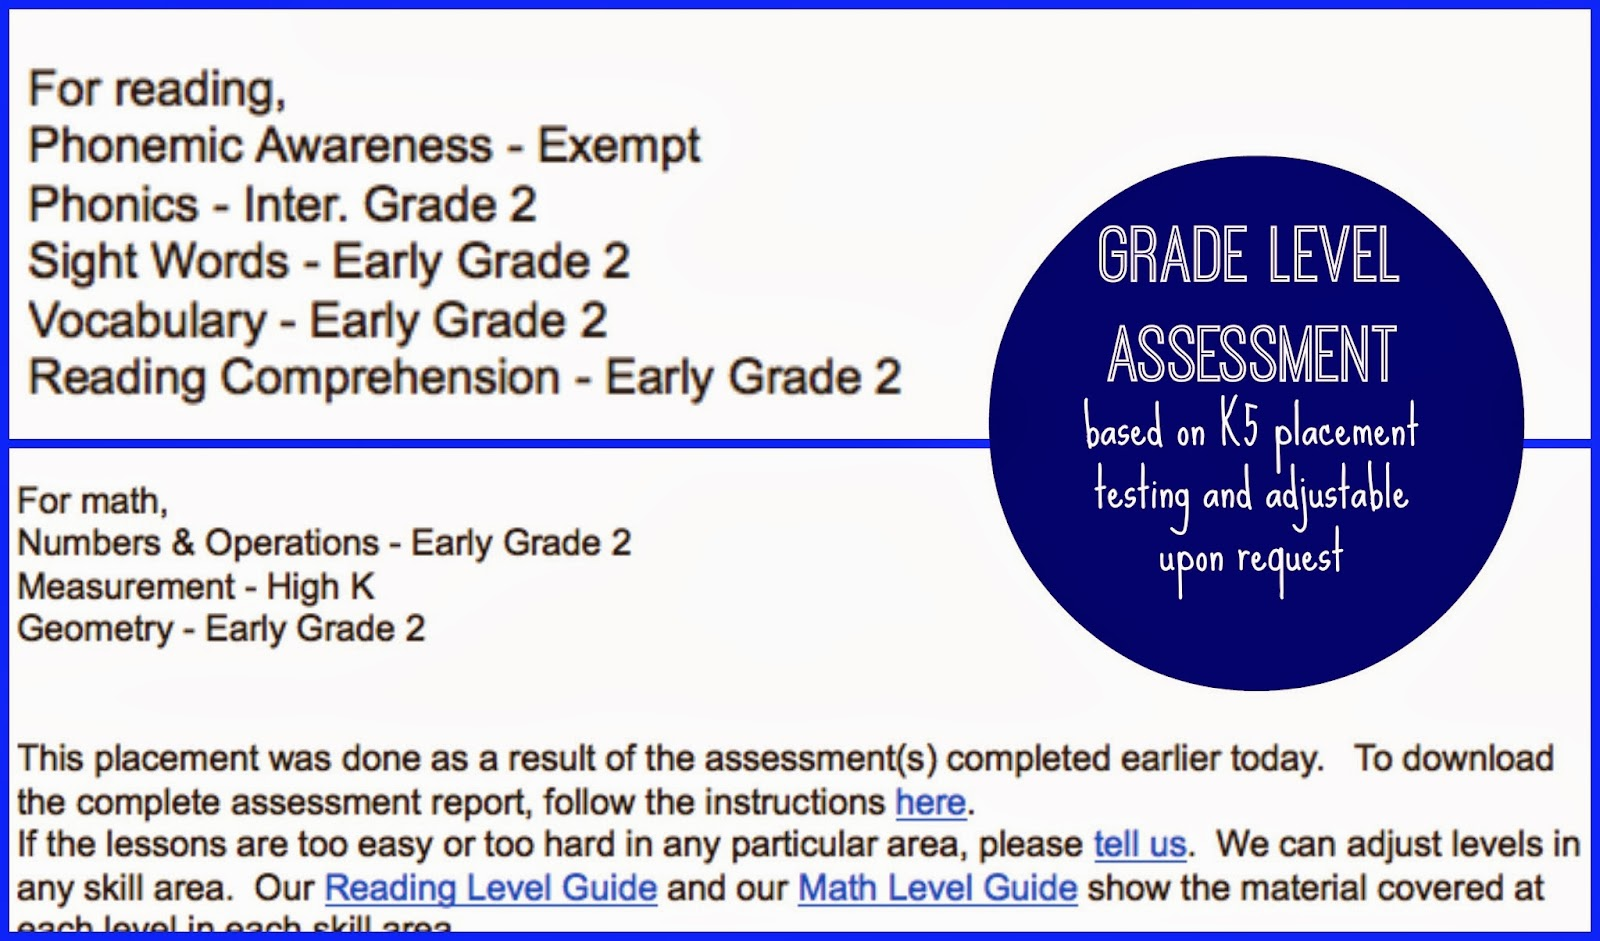 K5 Learning Reading Comprehension Grade 2